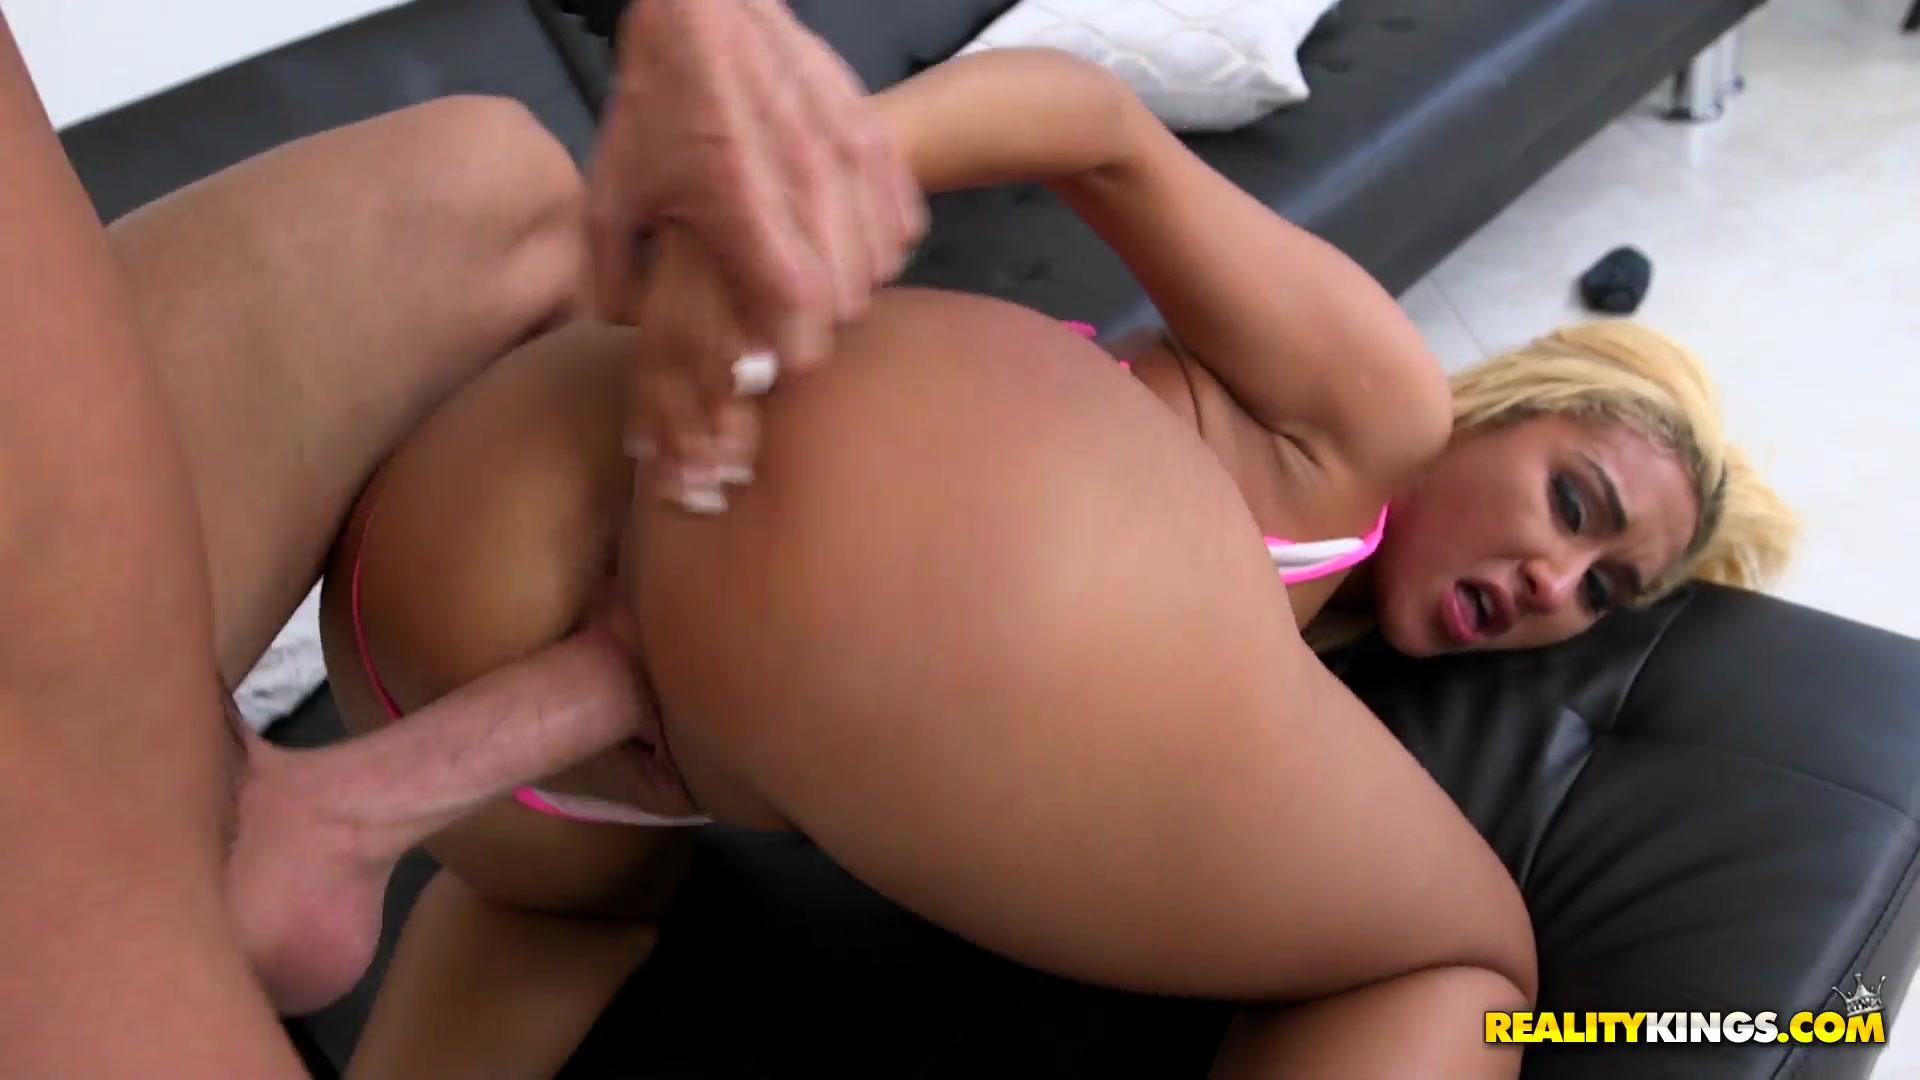 Freak sex video